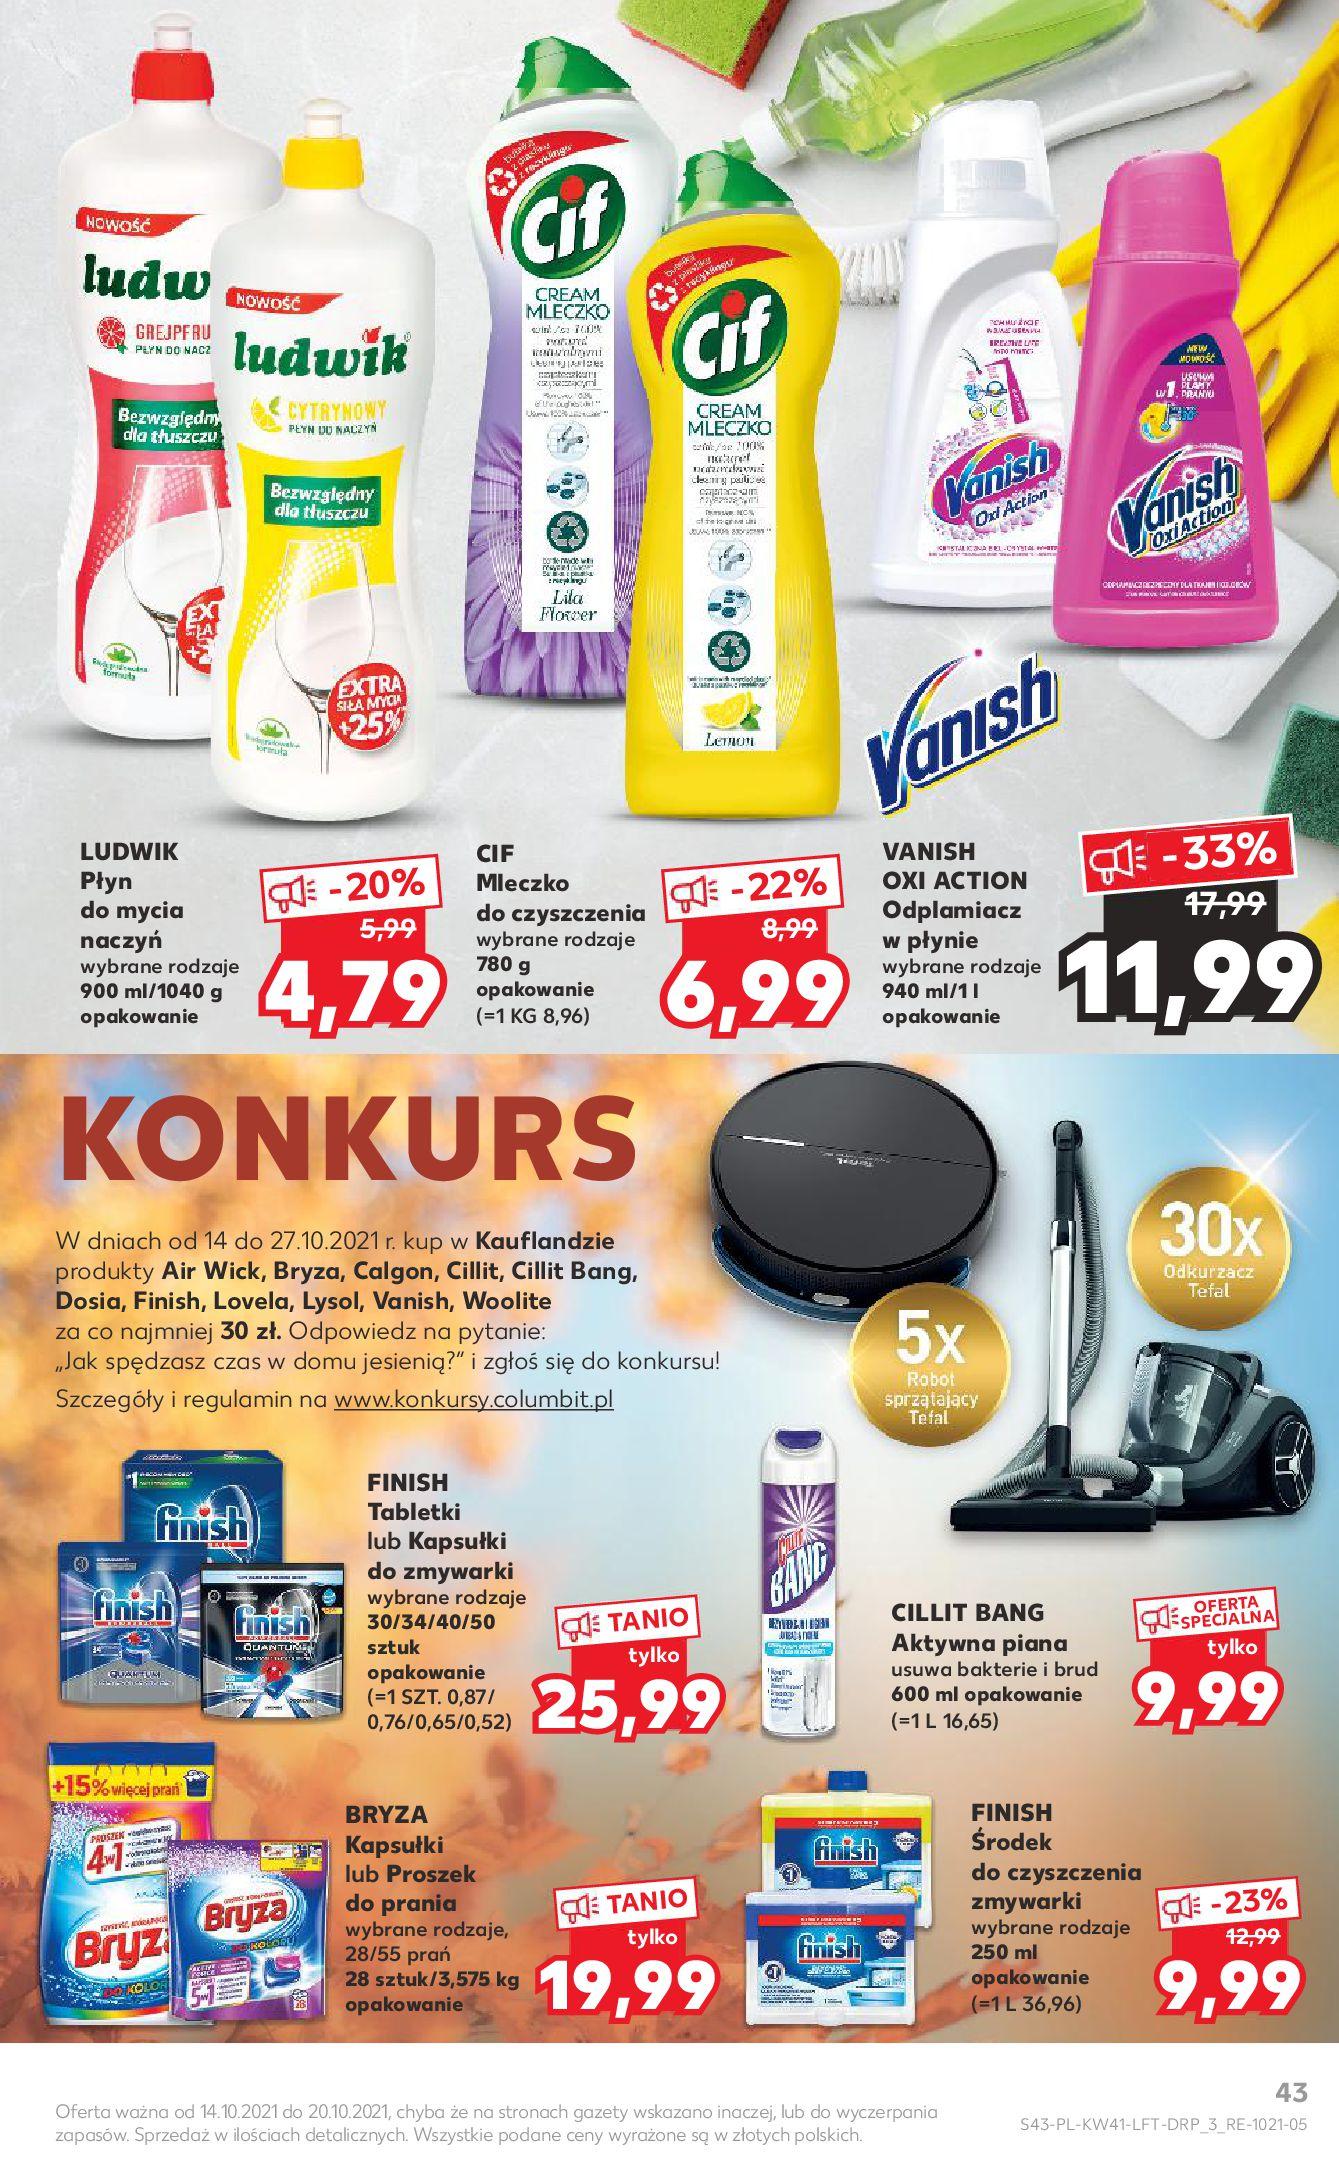 Gazetka Kaufland: Gazetka Kaufland 14-20.10. 2021-10-14 page-43